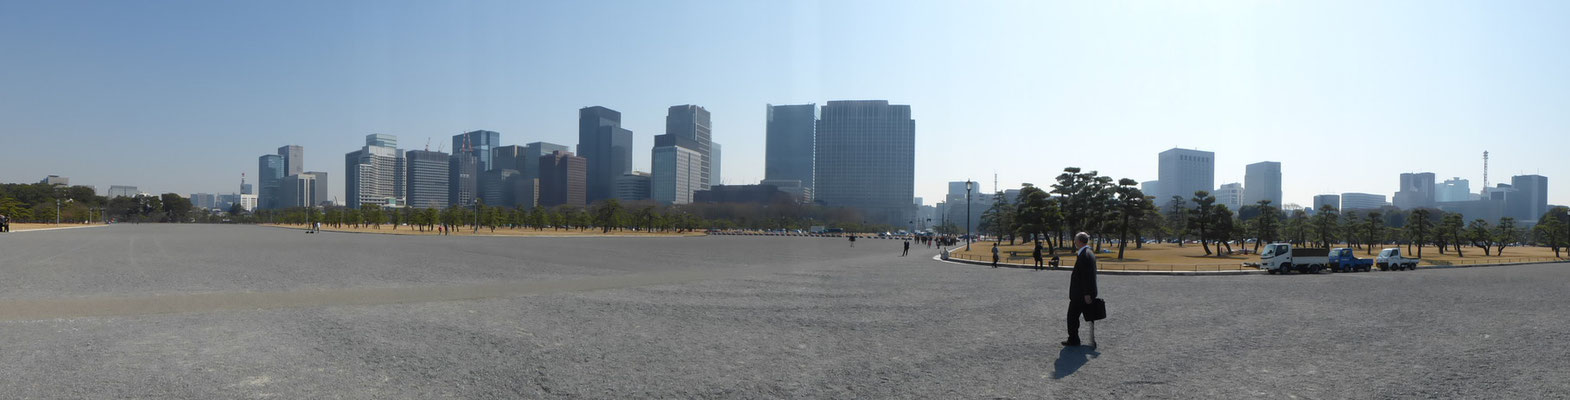 vor dem Kaiserpalast